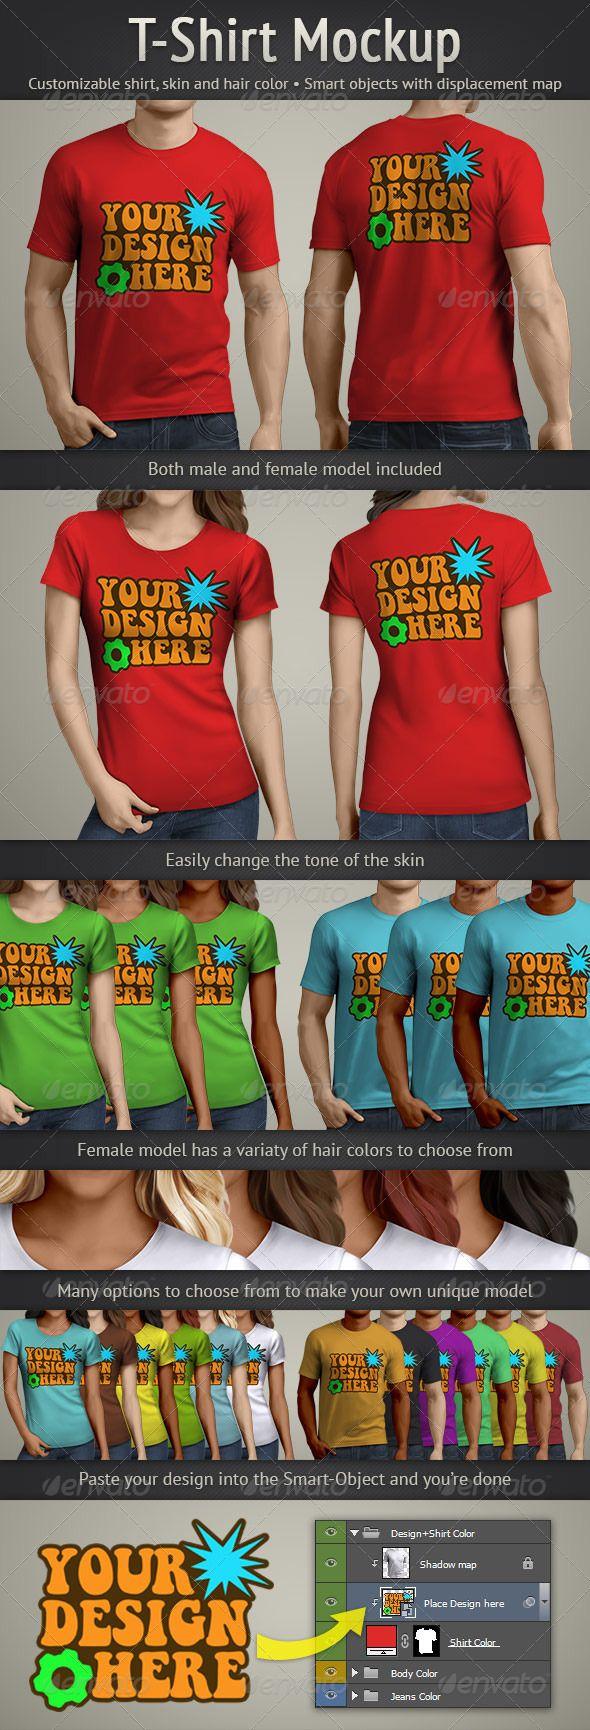 Design your own t-shirt female - T Shirt Mockup T Shirt Mockupmockup Designcustomizable